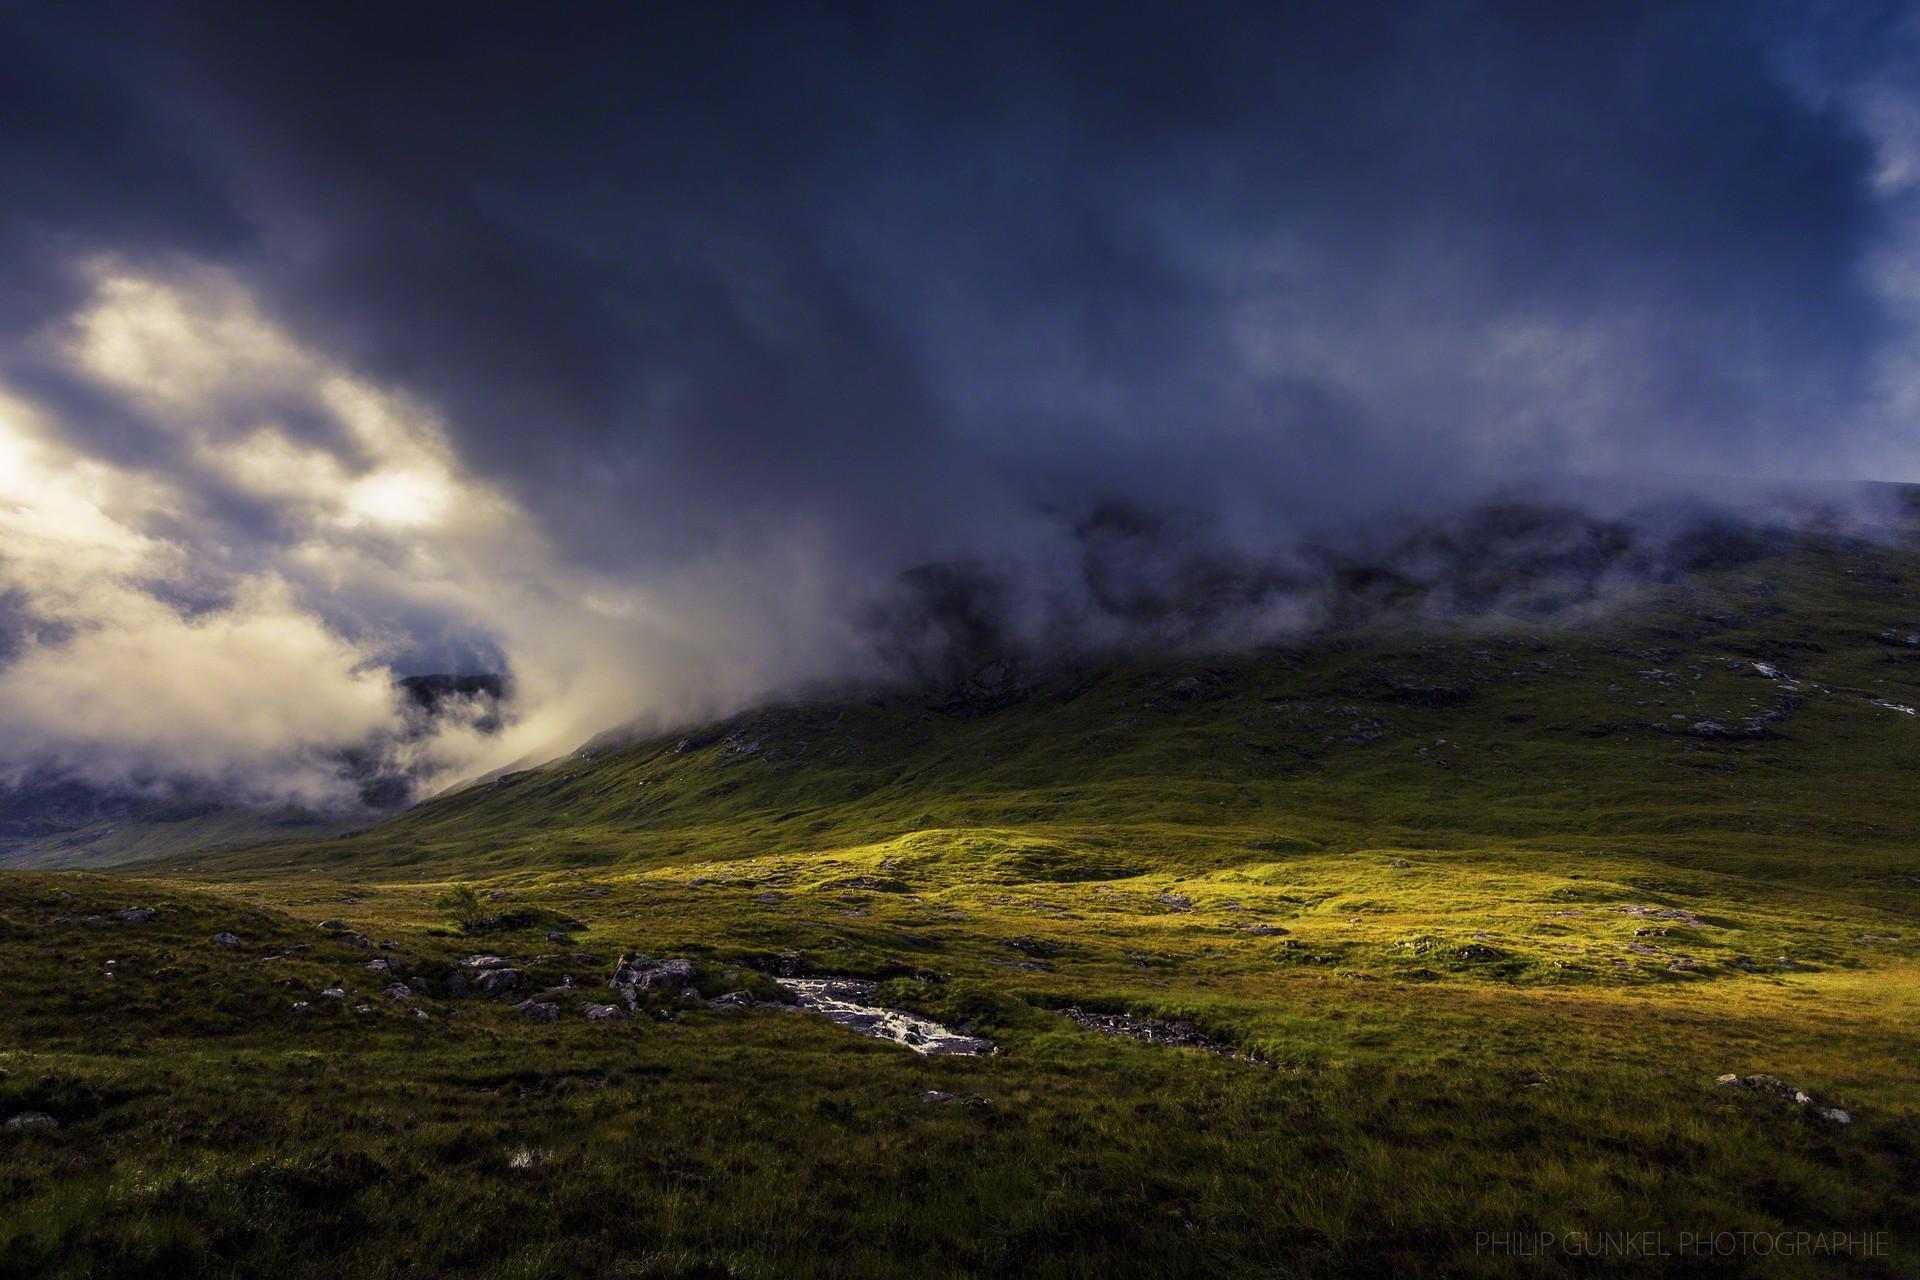 scotland_philip_gunkel_photographie_www.philipgunkel.de02